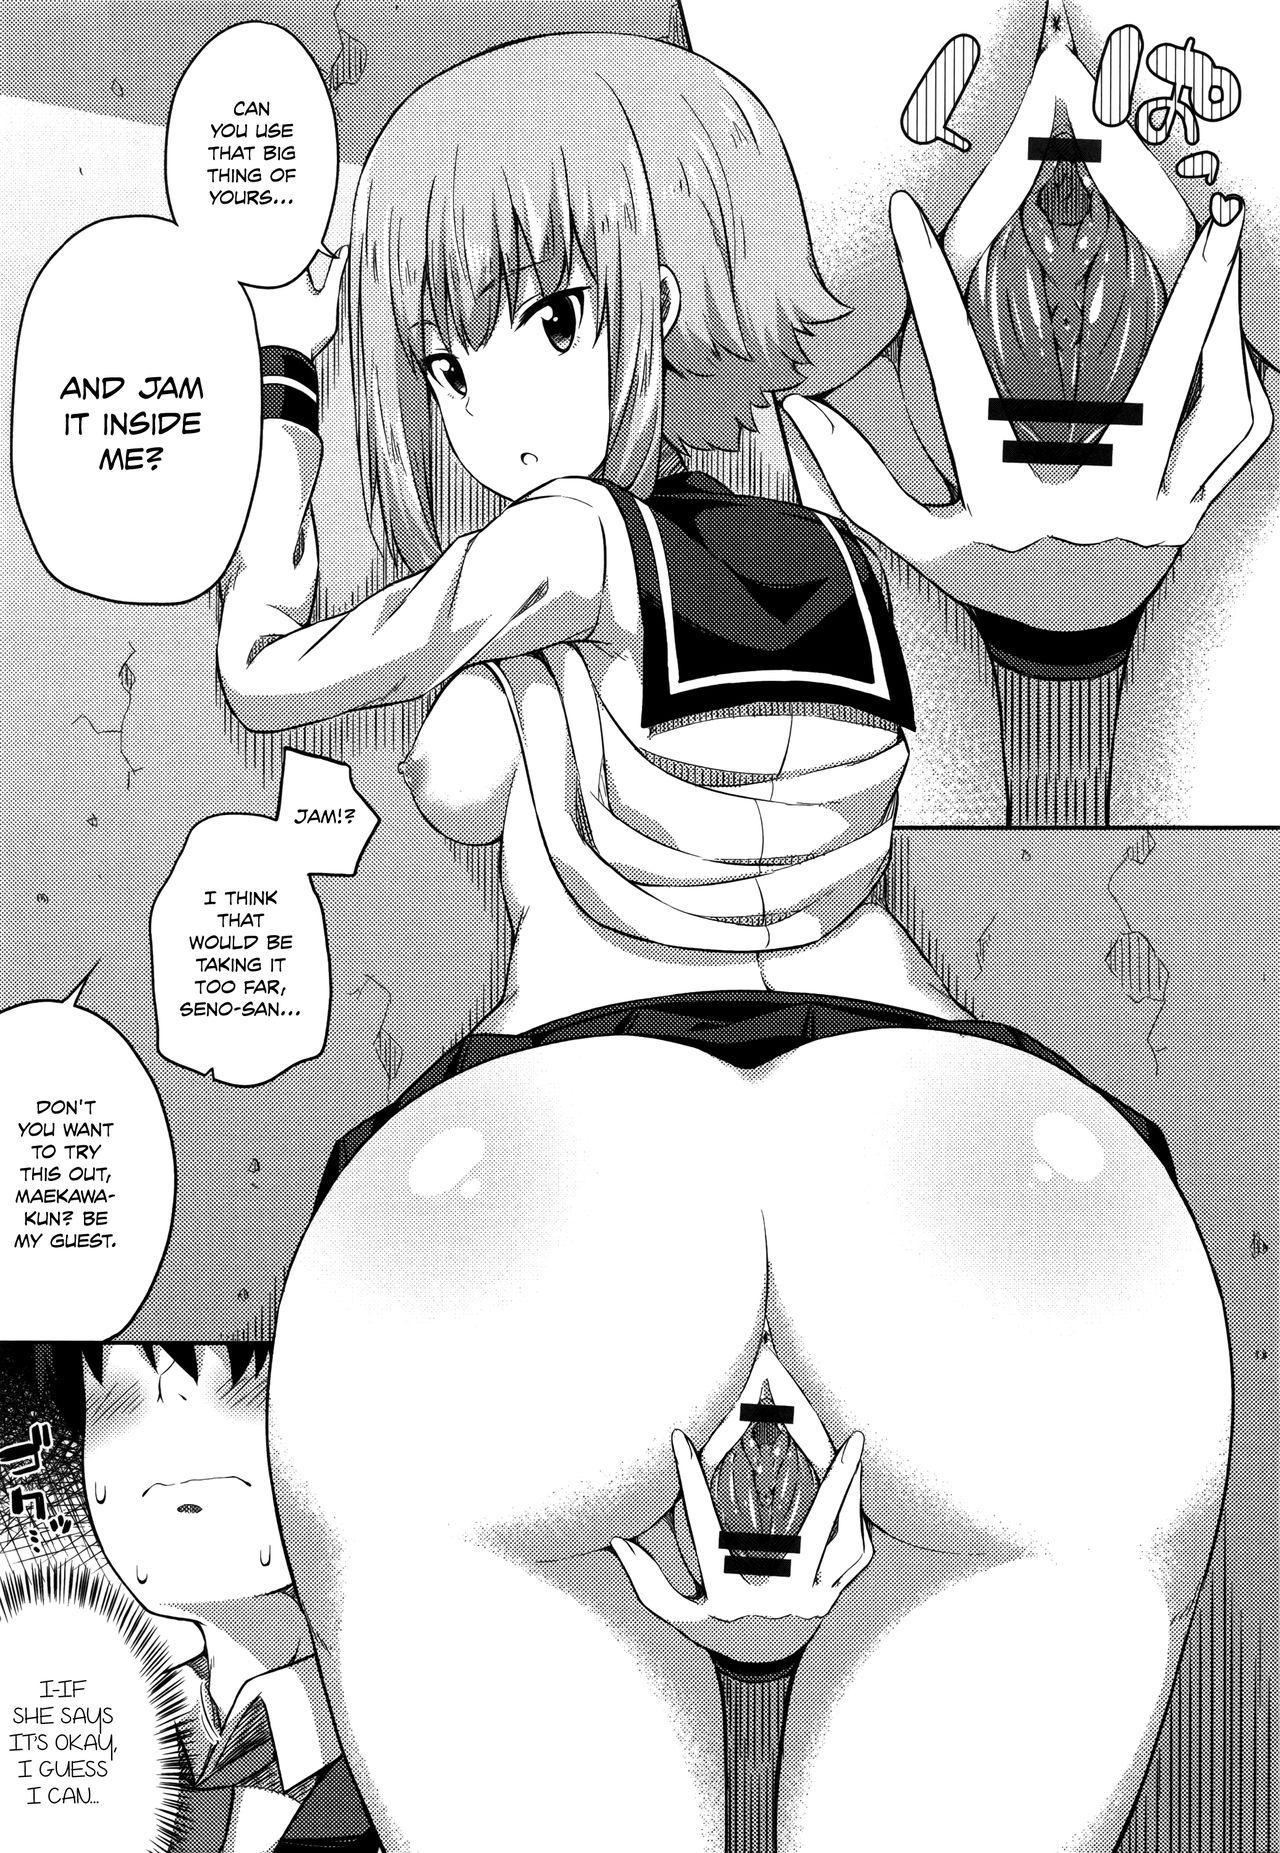 Kimi ga Haramu made Nando mo Aishiteru | I'll love you many times until you get pregnant 101